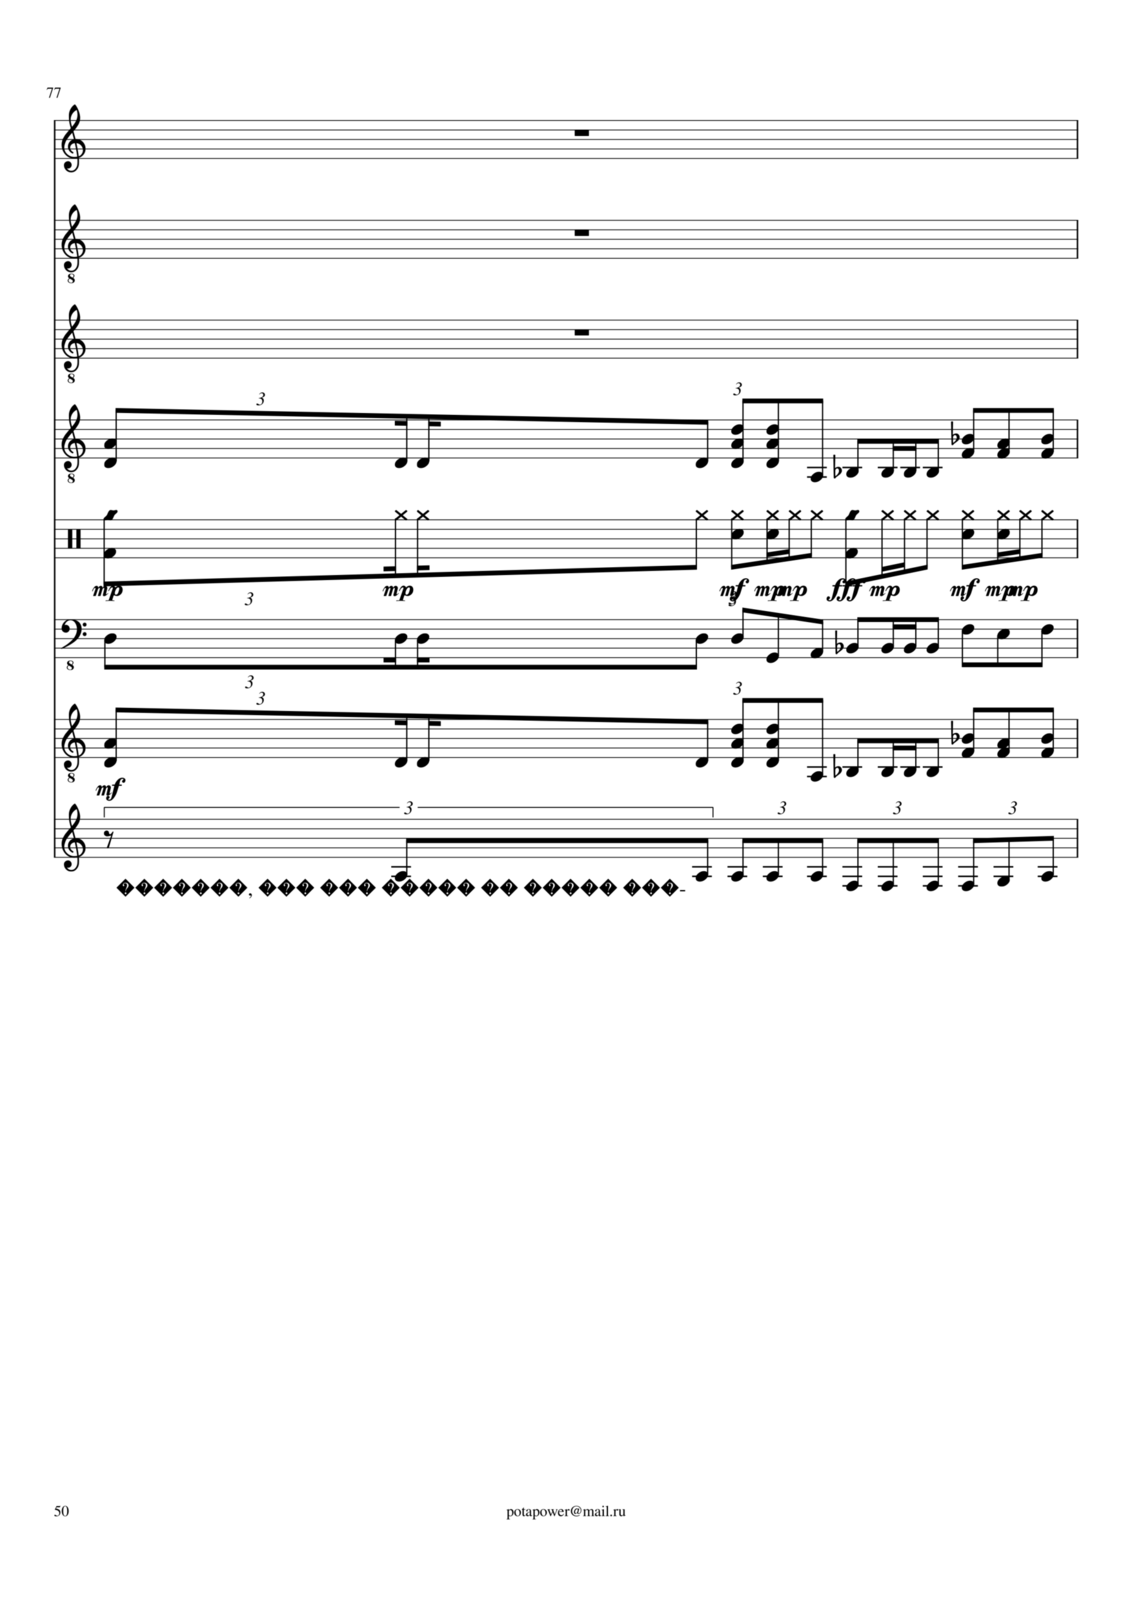 Korolevstvo slez slide, Image 50